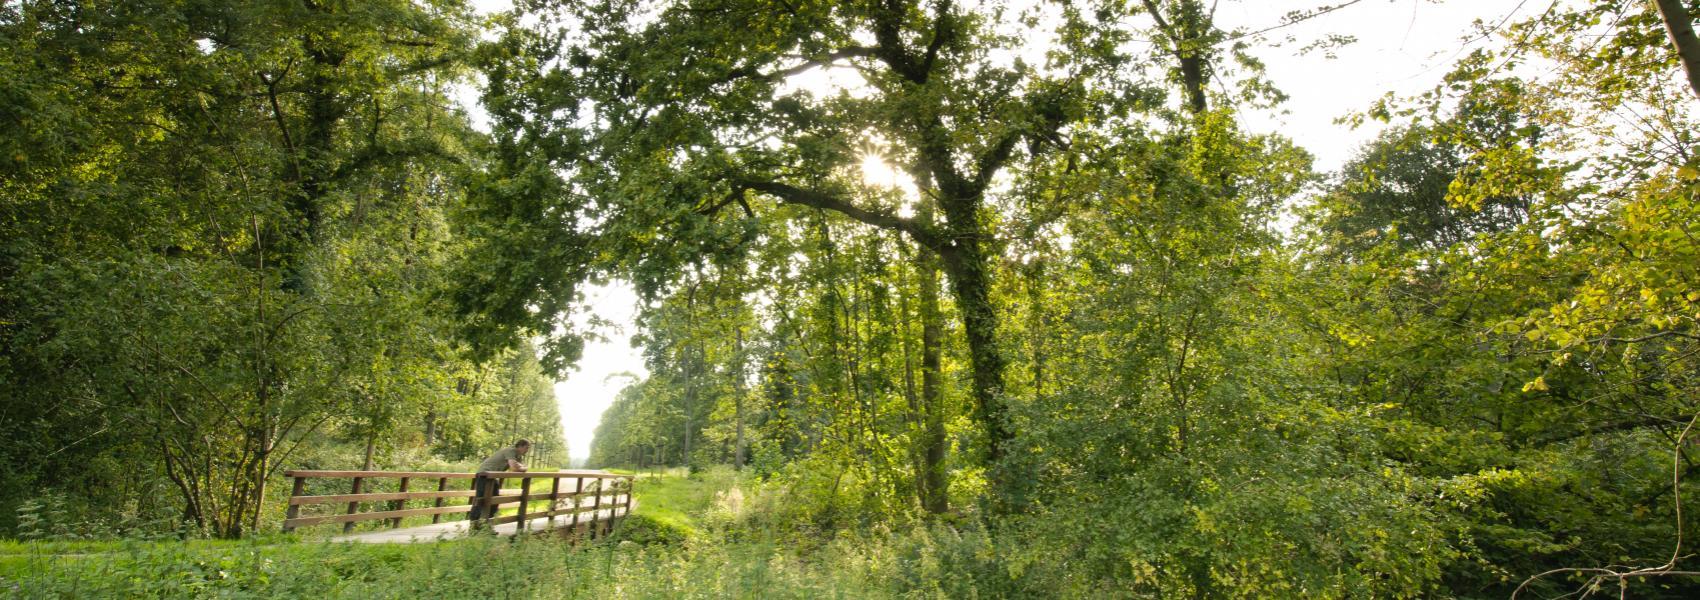 man leunend op brugje in het bos